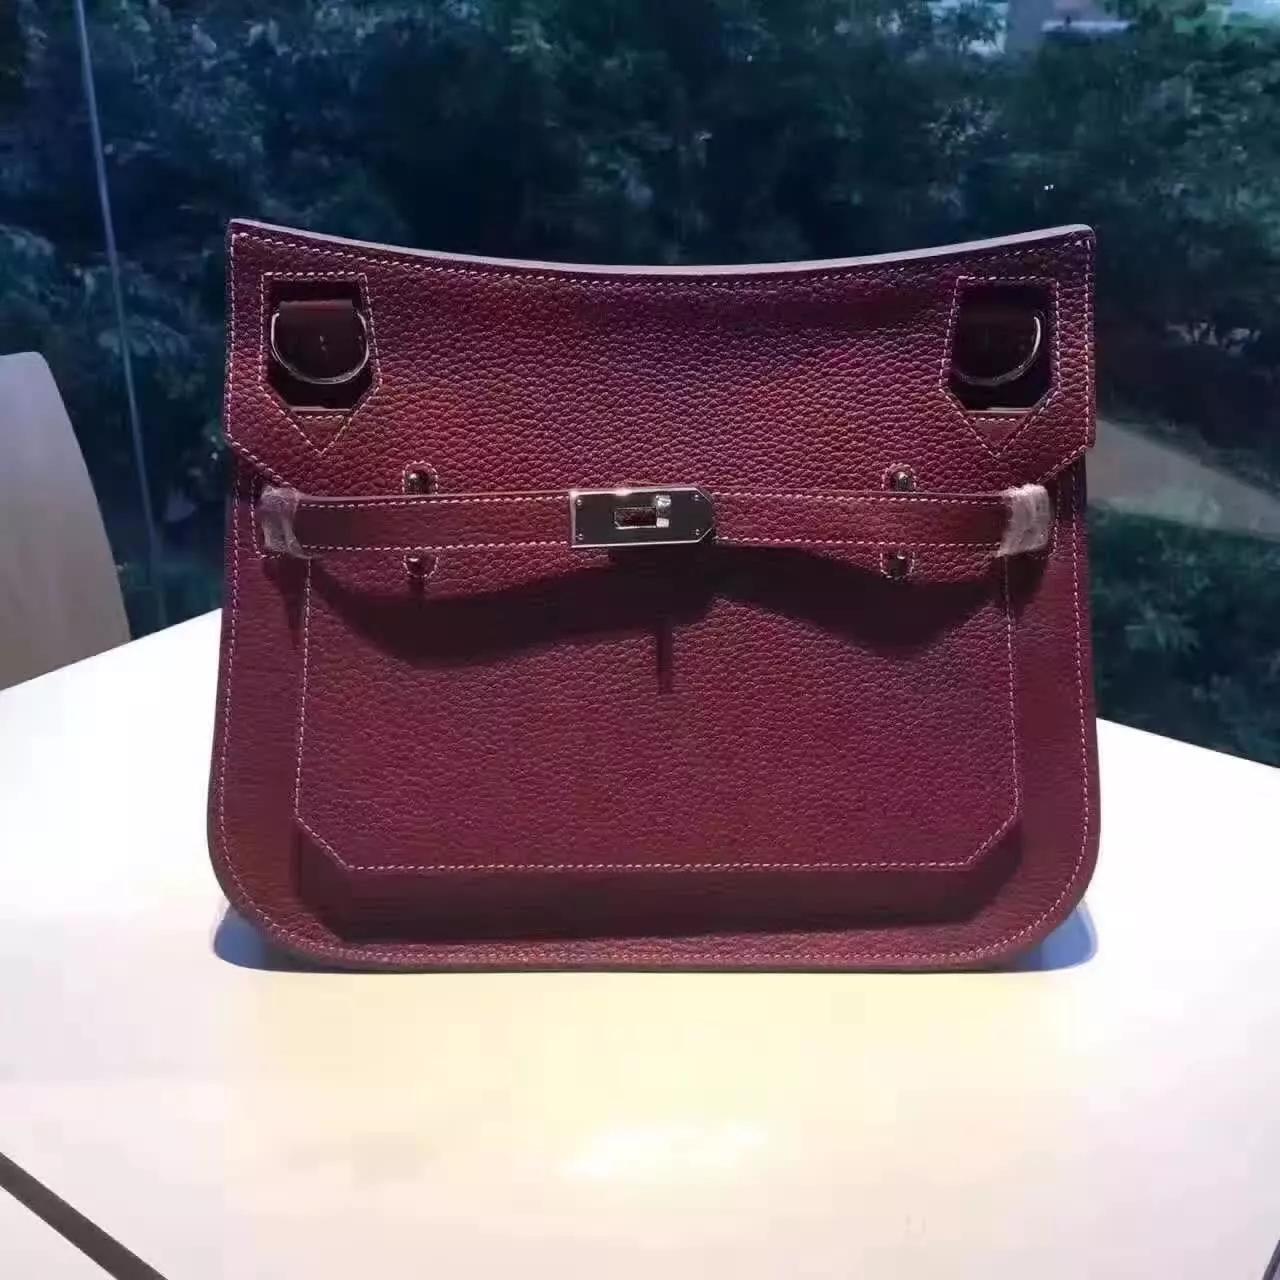 Hermes Jypsiere Leather Shoulder Bag Dark Red